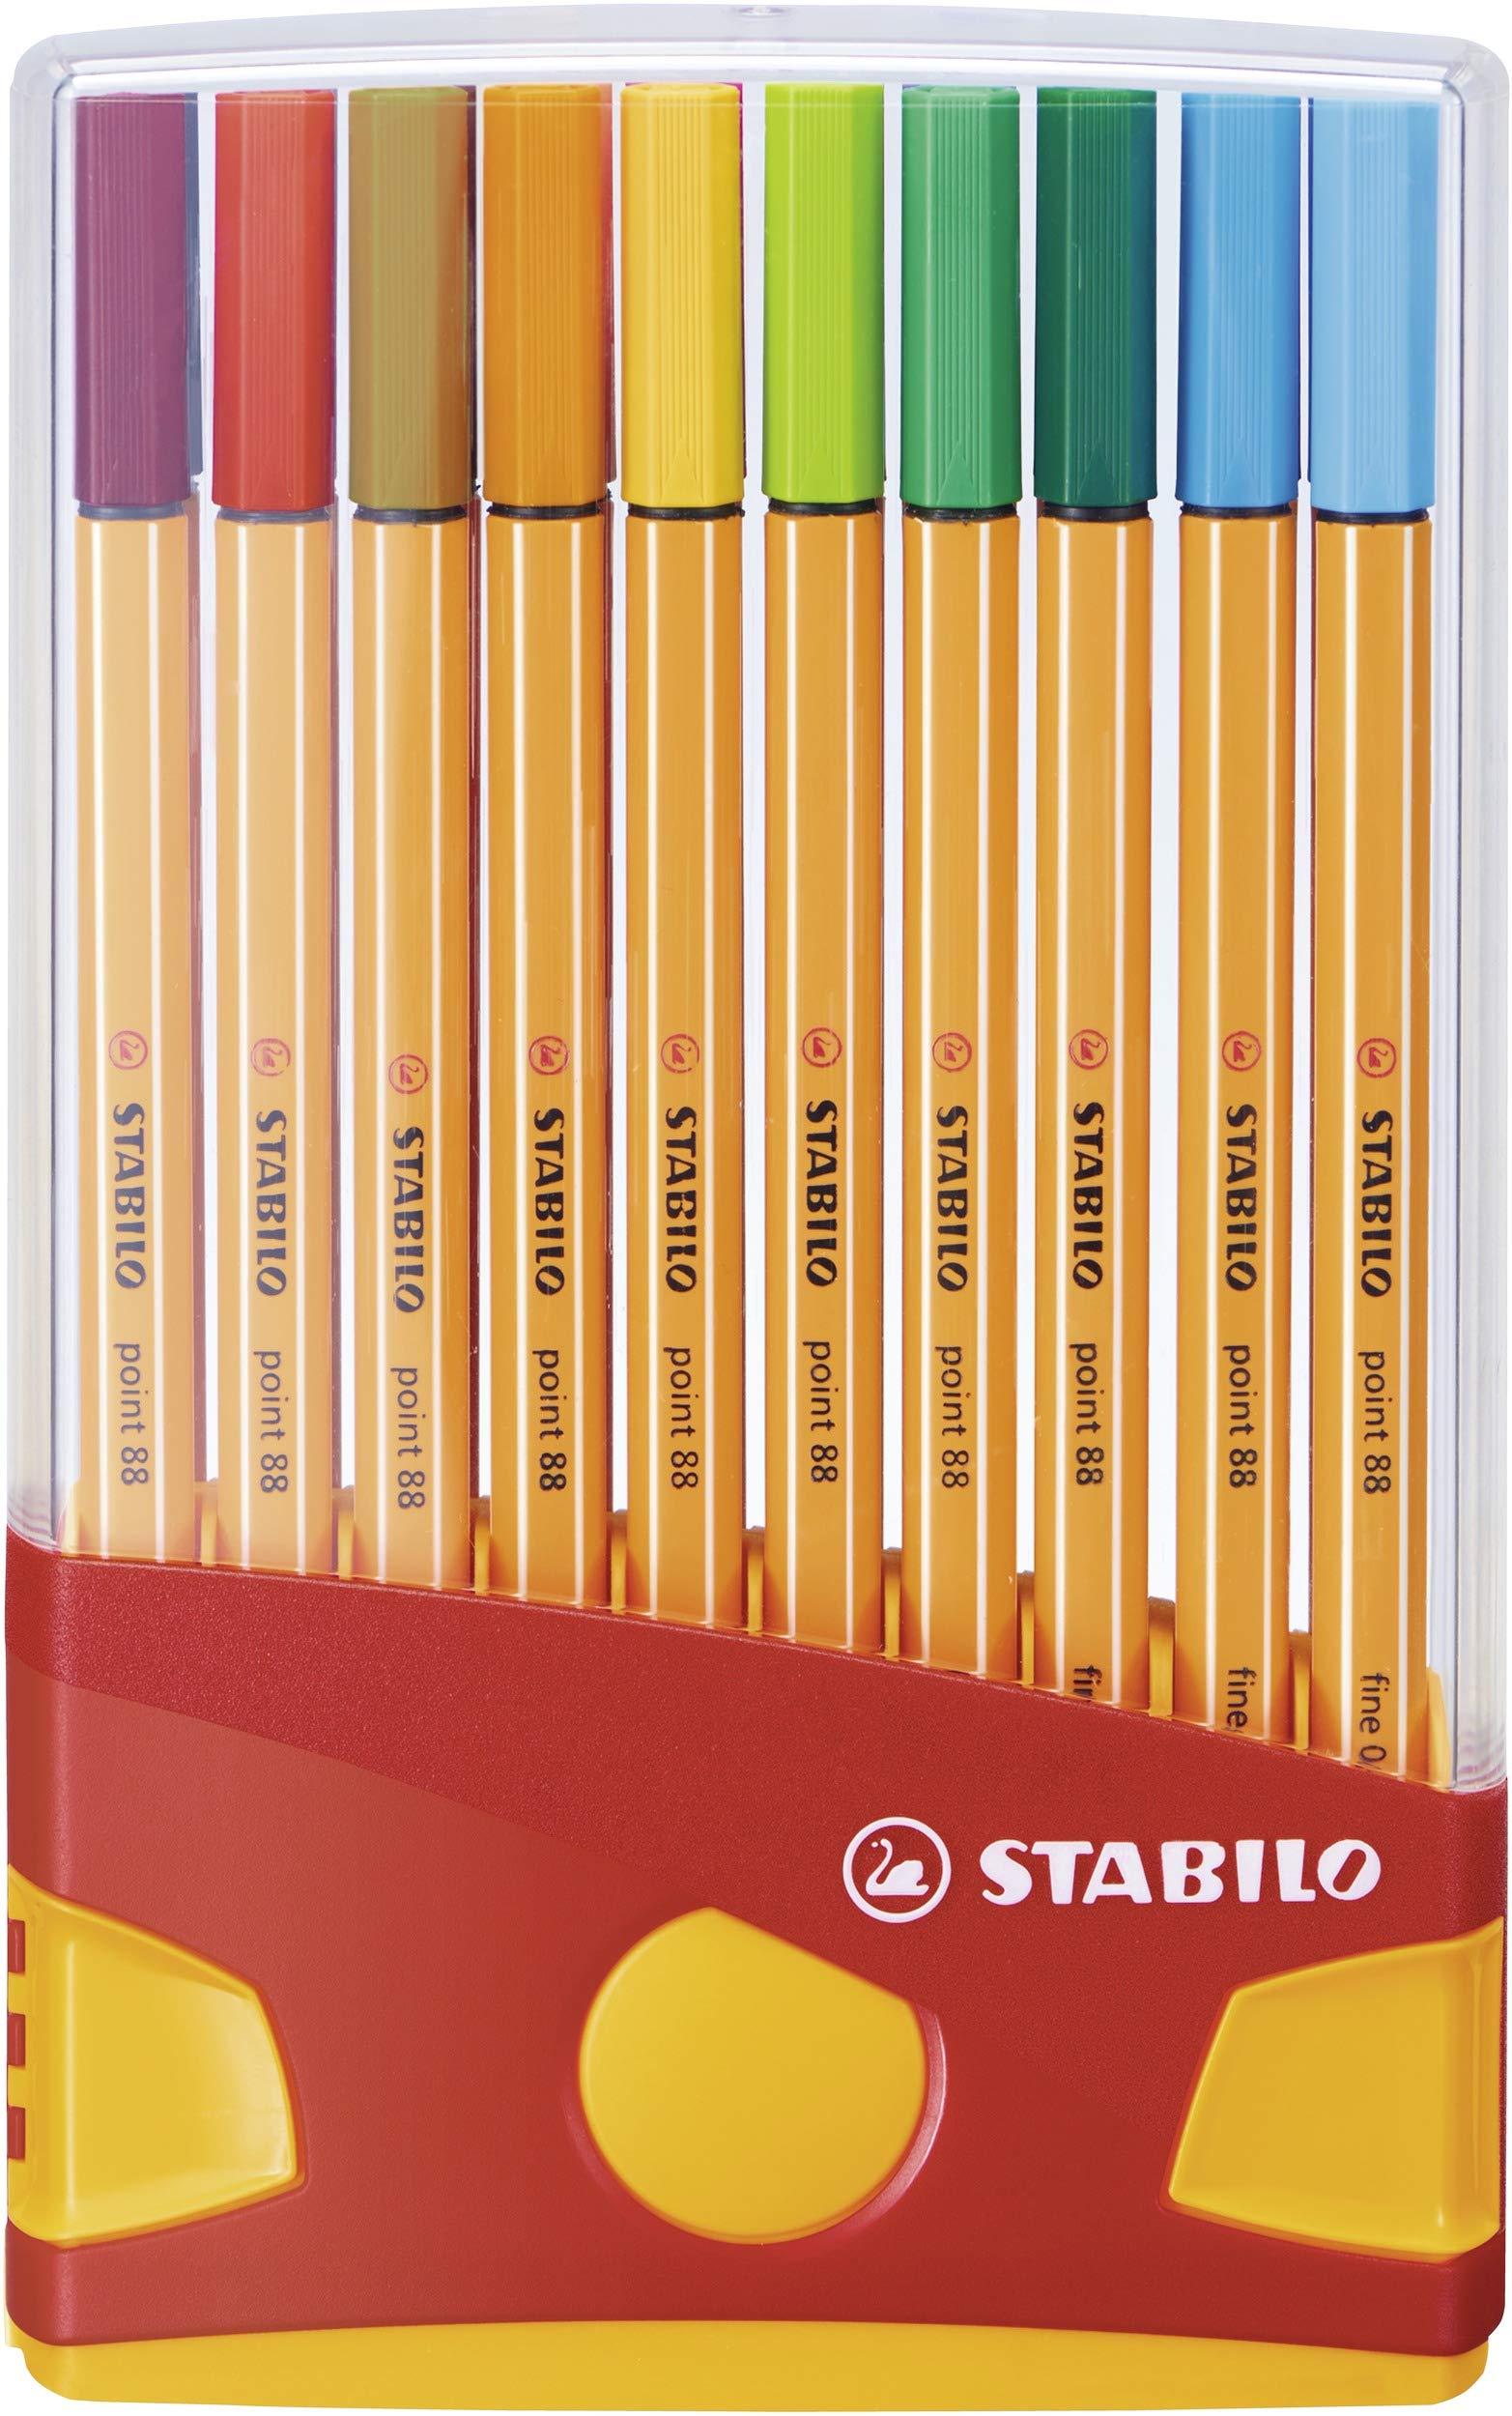 Stabilo Point 88 Fineliner Pens, 0.4 mm - 20-Color Plastic Case Set by STABILO